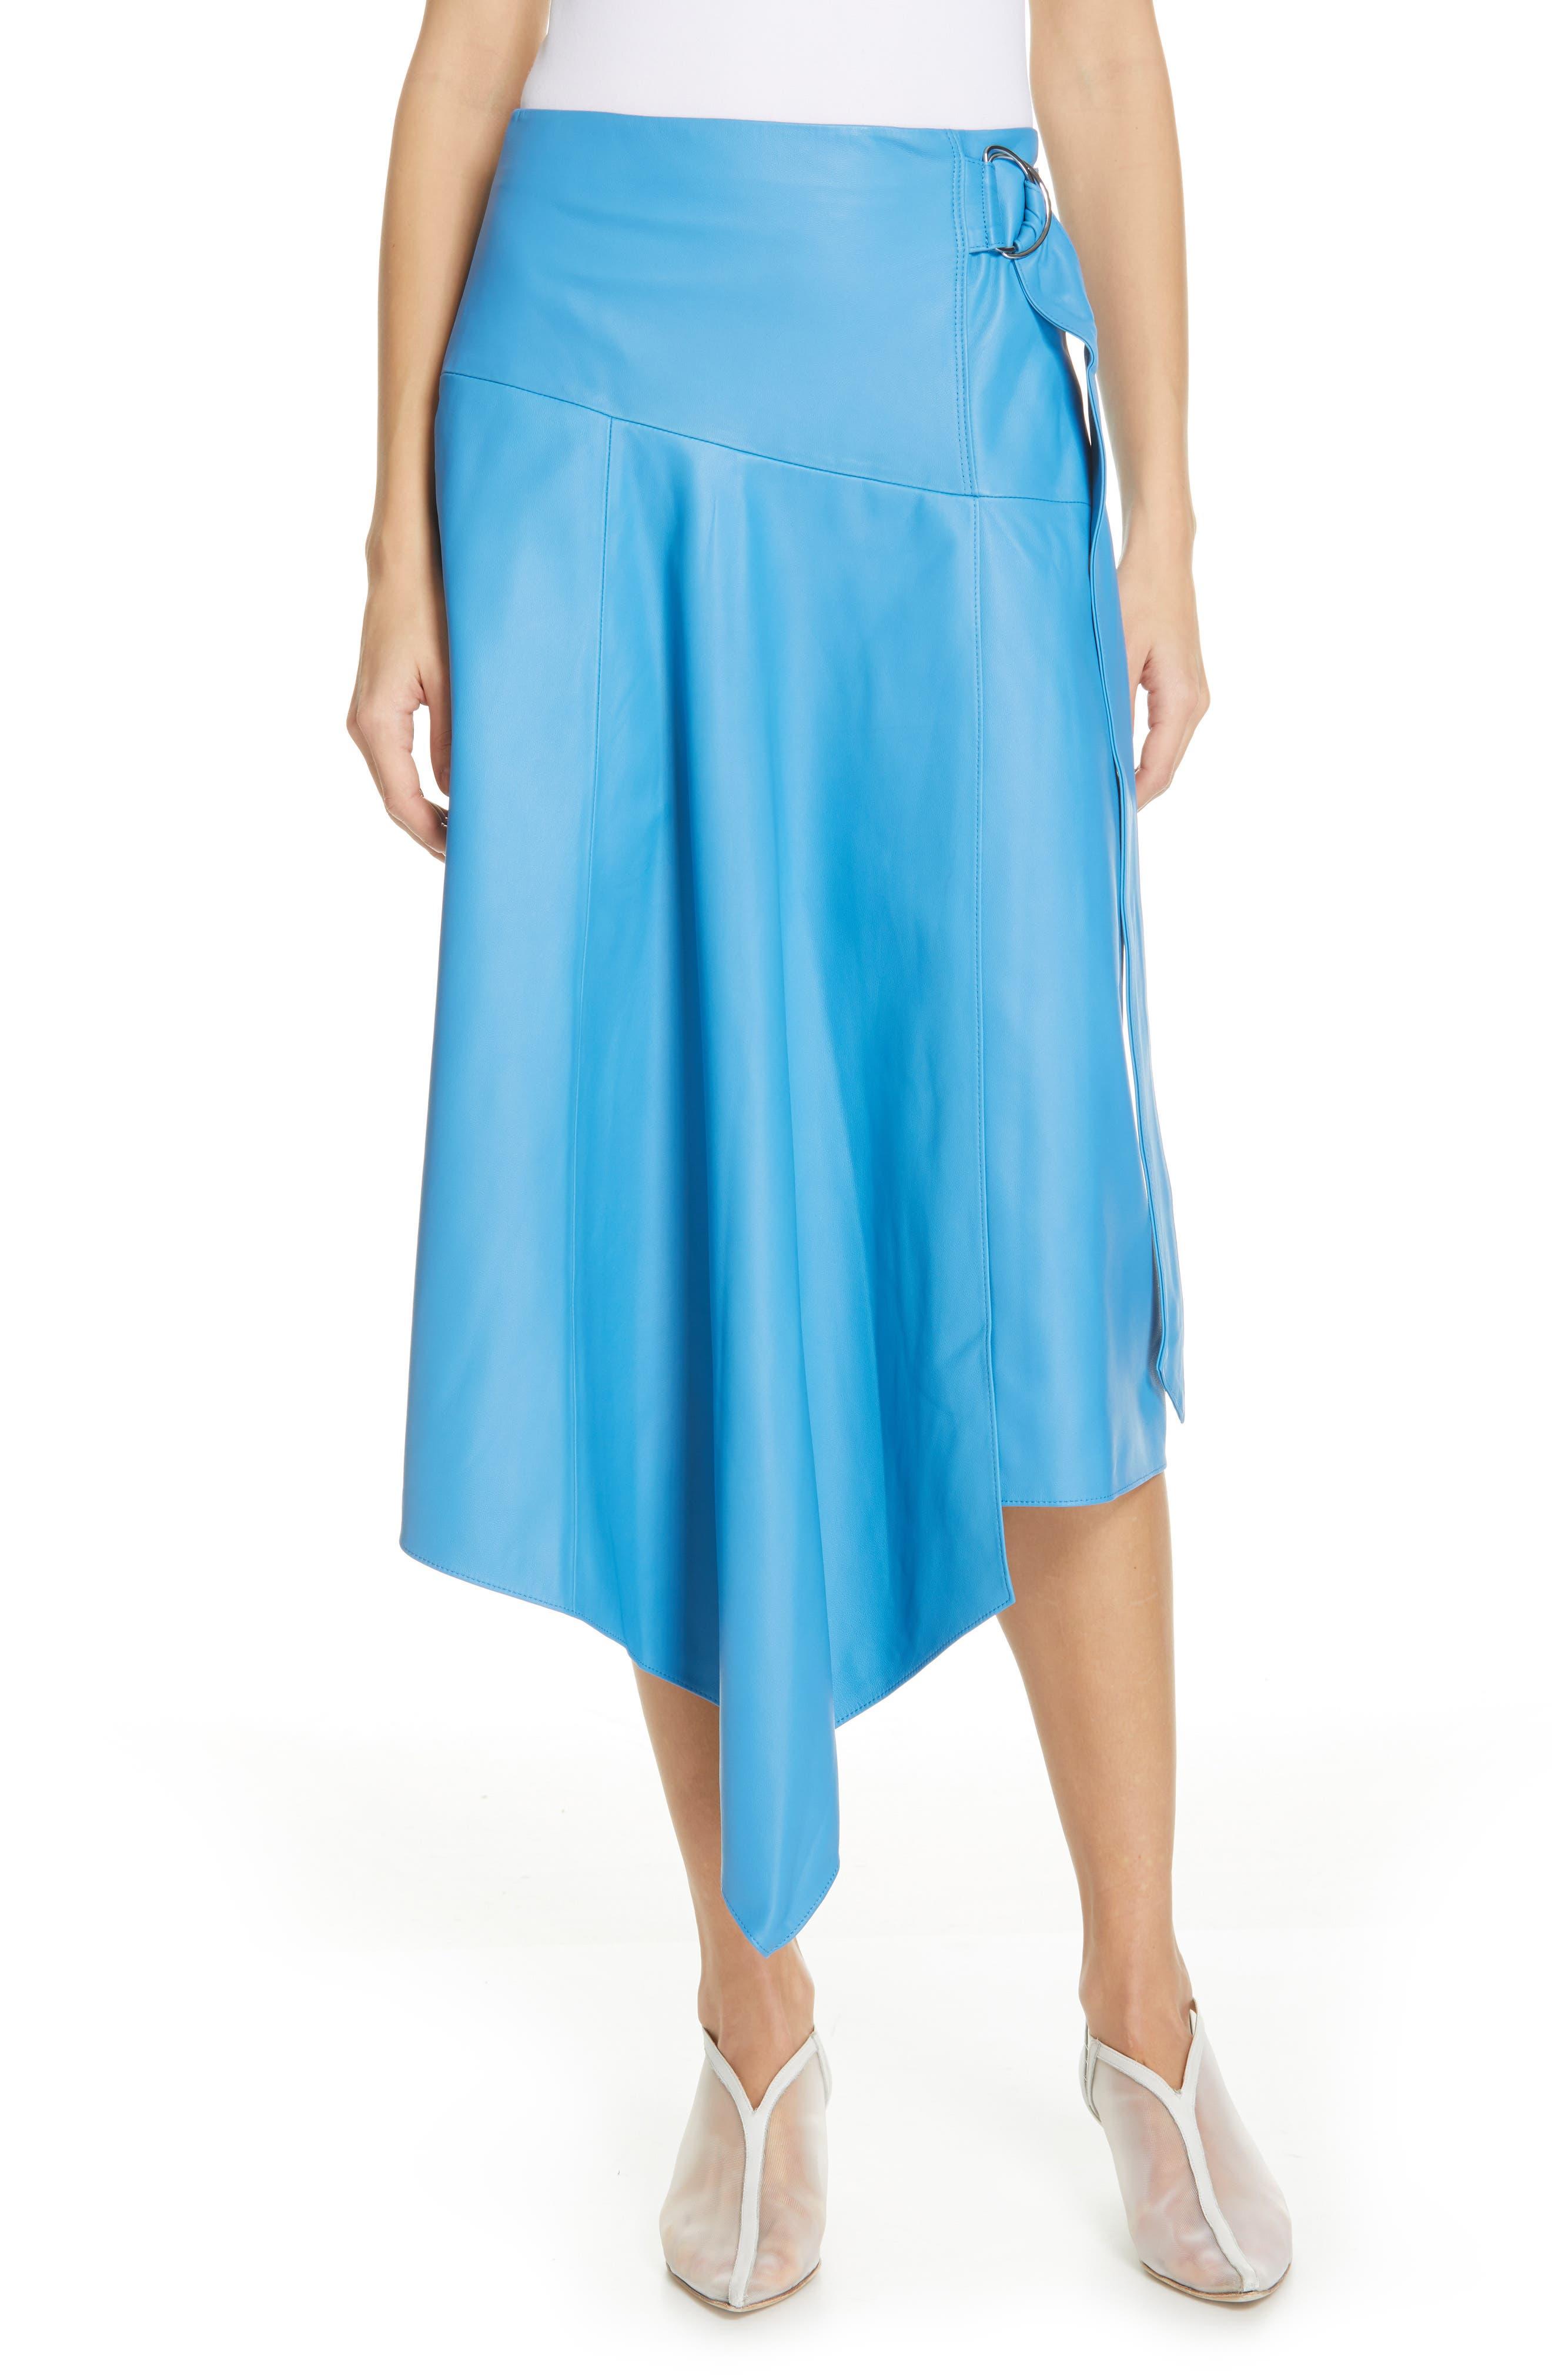 TIBI,                             Asymmetrical Drape Tissue Leather Skirt,                             Main thumbnail 1, color,                             OCEAN BLUE